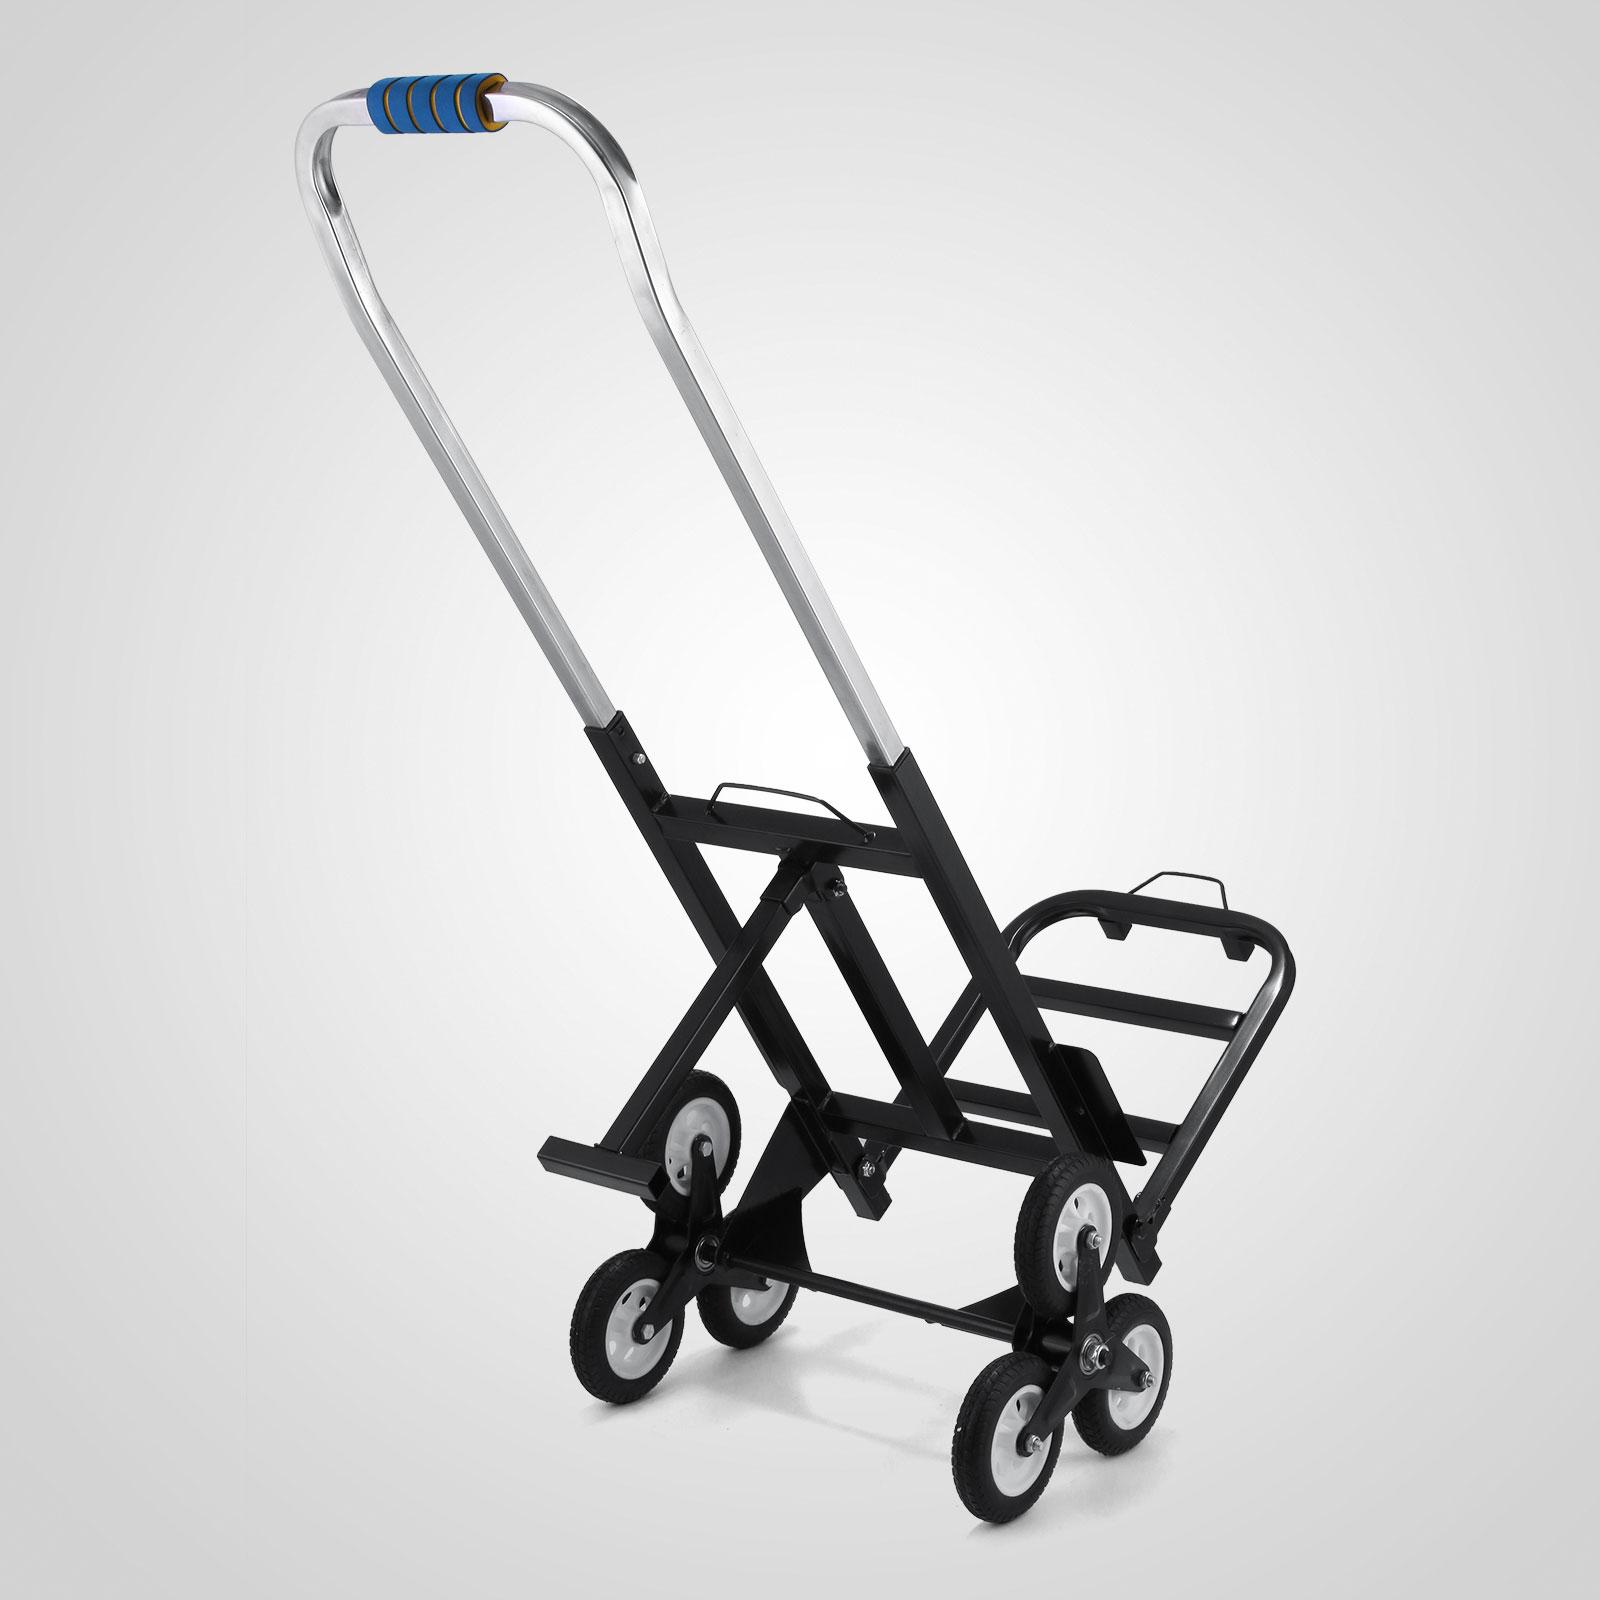 Portable Stair Climbing Folding Cart Climb Moving Up To